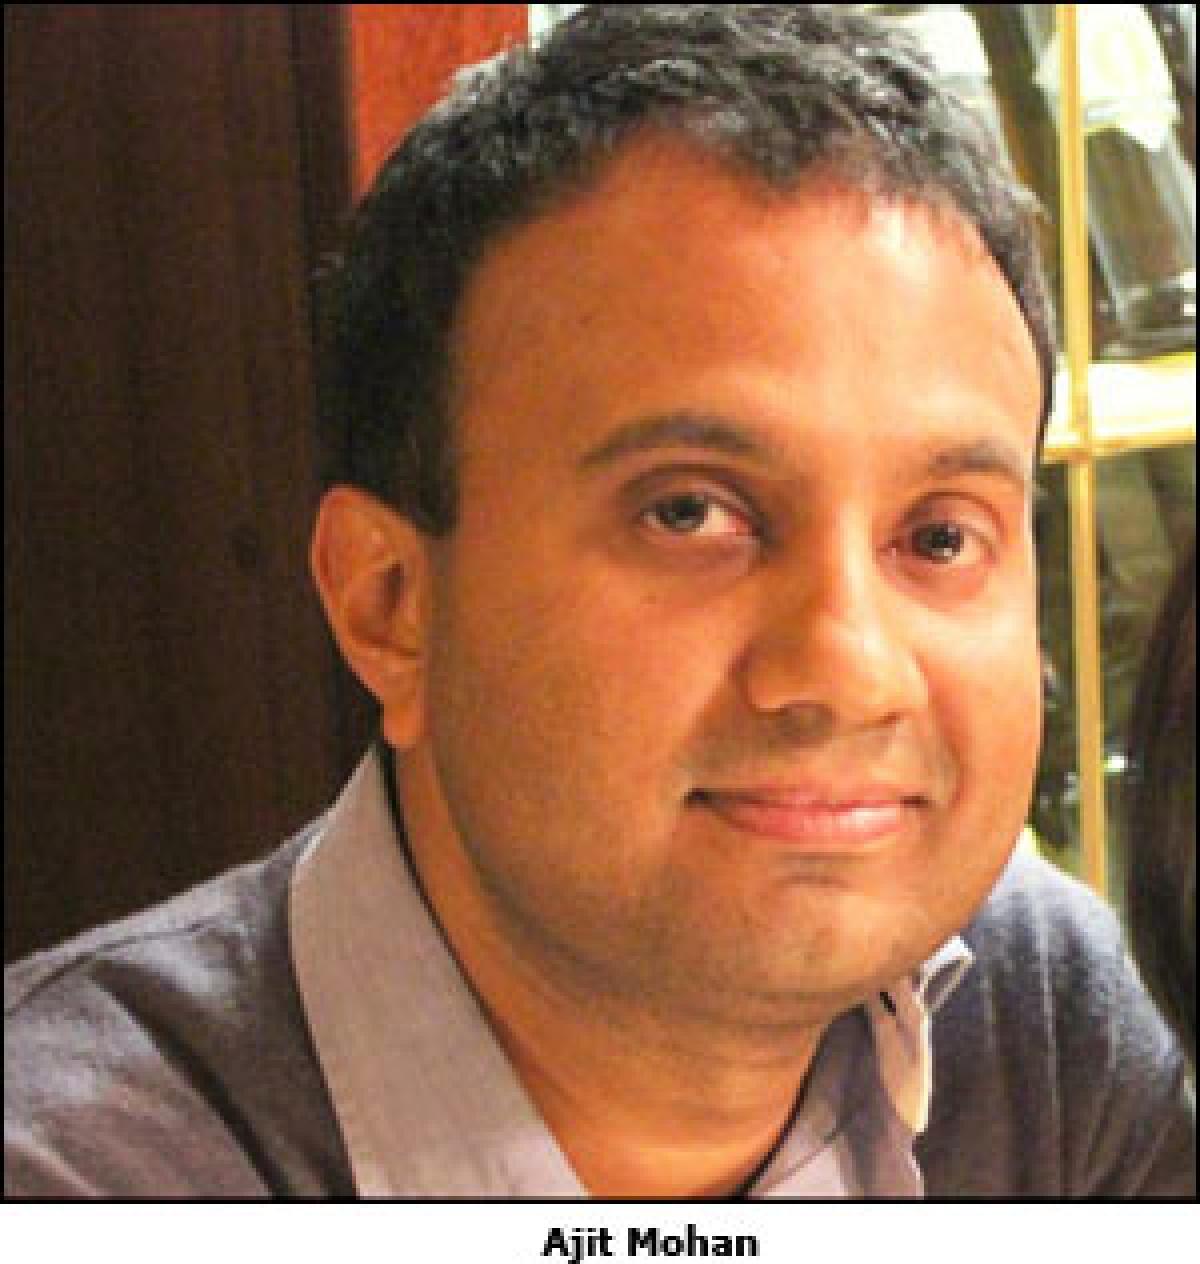 Starsports.com unveils IPL 2014 campaign